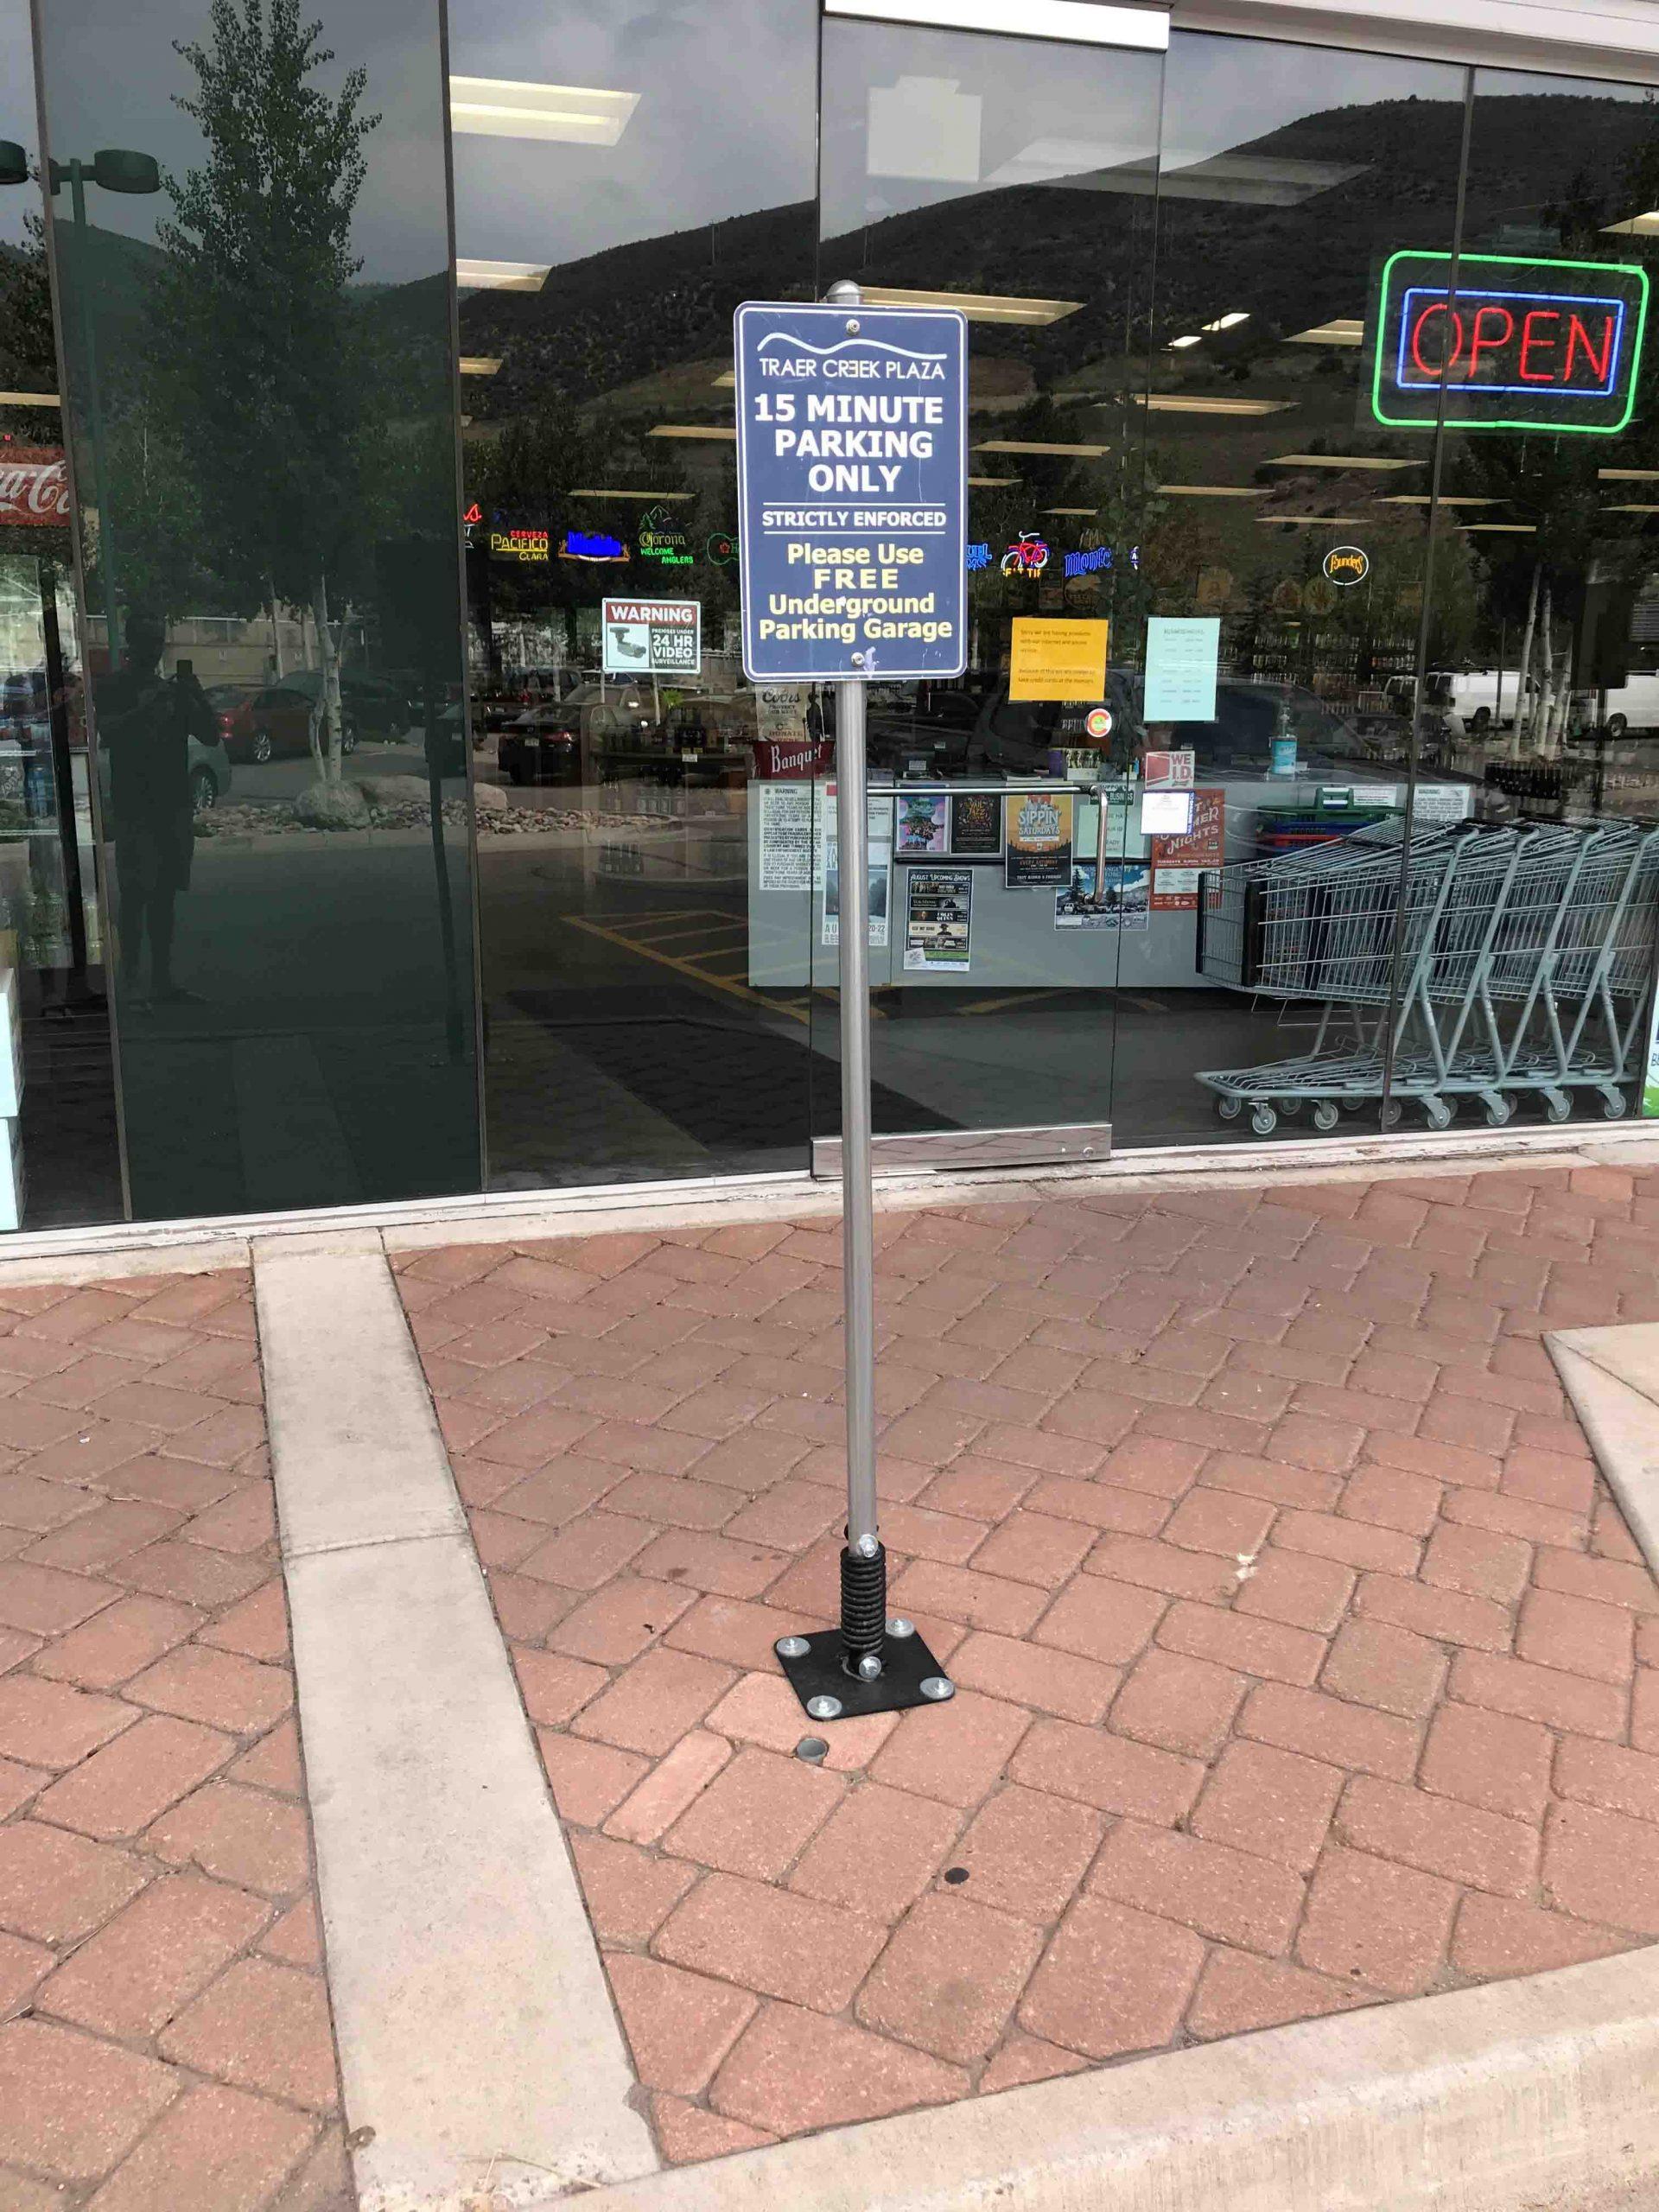 Traer Creek Plaza - 15 Minute Parking - FlexPost